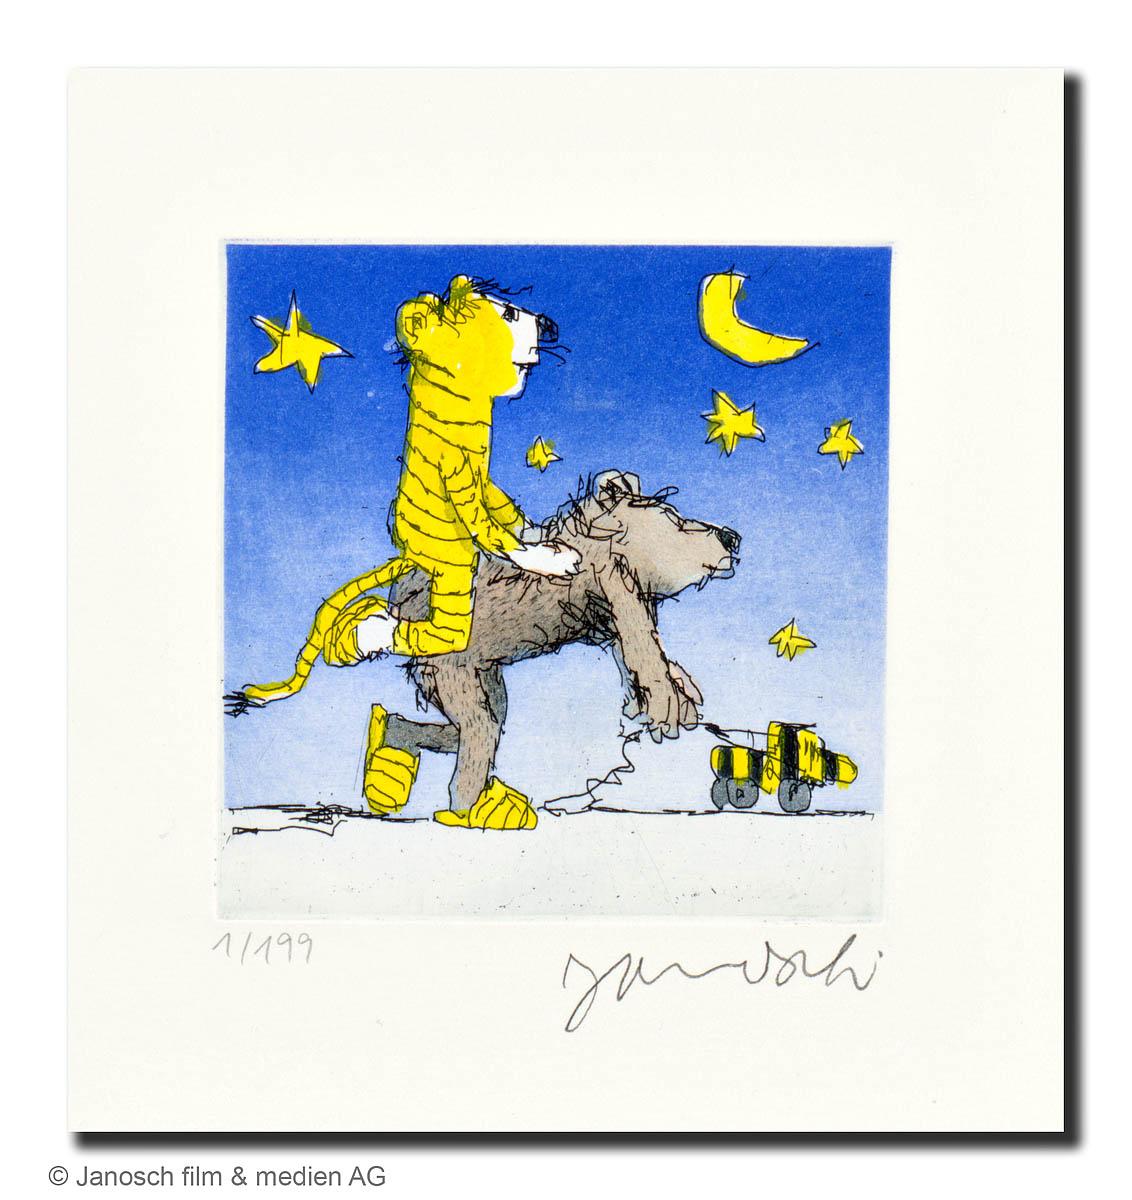 Janosch: Guter Bär, du gehst so stille, Farbradierung, Blattformat 26 x 28 cm, Motiv 10 x 10 cm, 190 eur.© Janosch film & medien AG